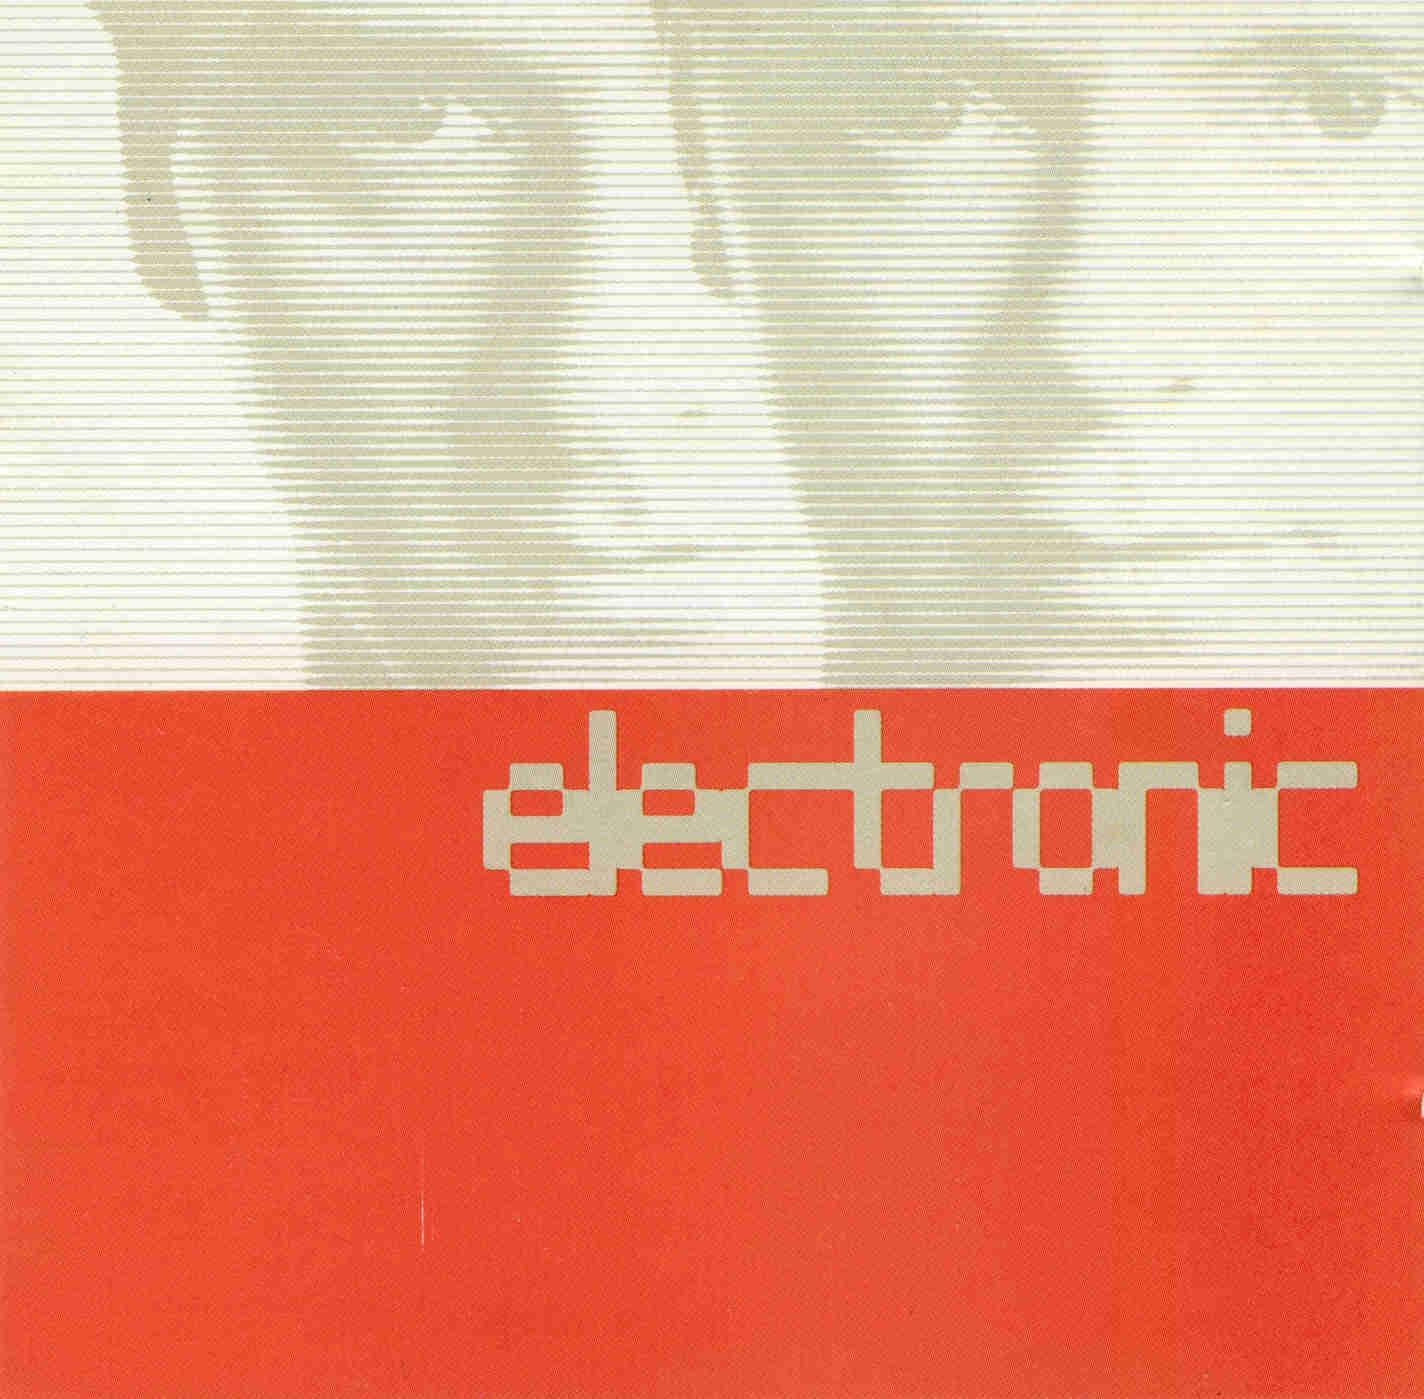 Classic Album: Electronic - Electronic